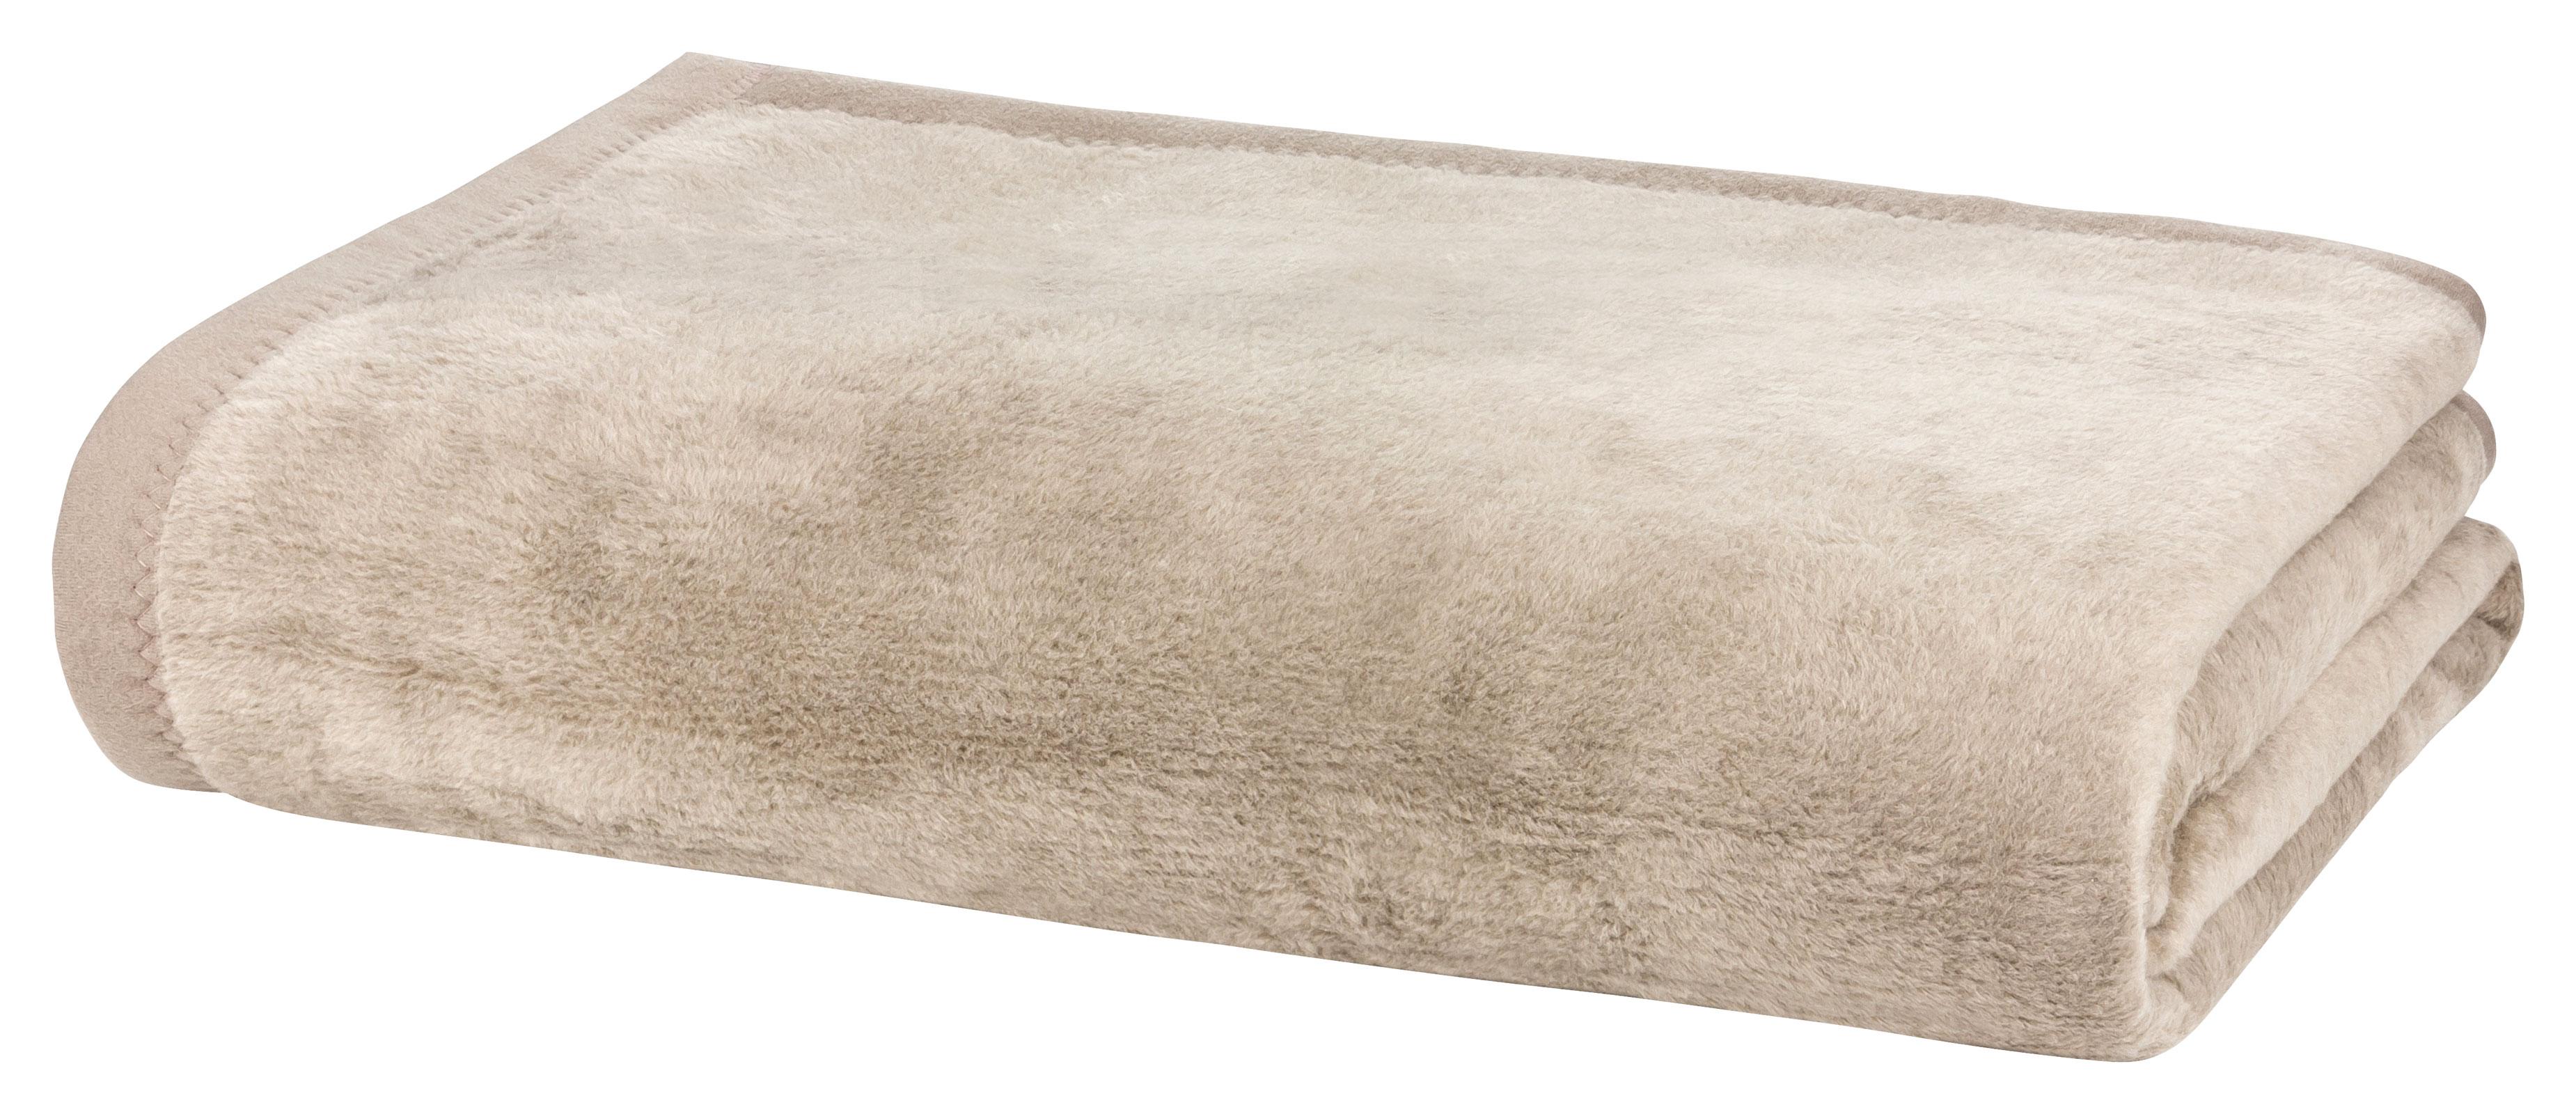 wohndecke moon xxl 220x240 wolldecke tagesdecke baumwolldecke schlafdecke ebay. Black Bedroom Furniture Sets. Home Design Ideas